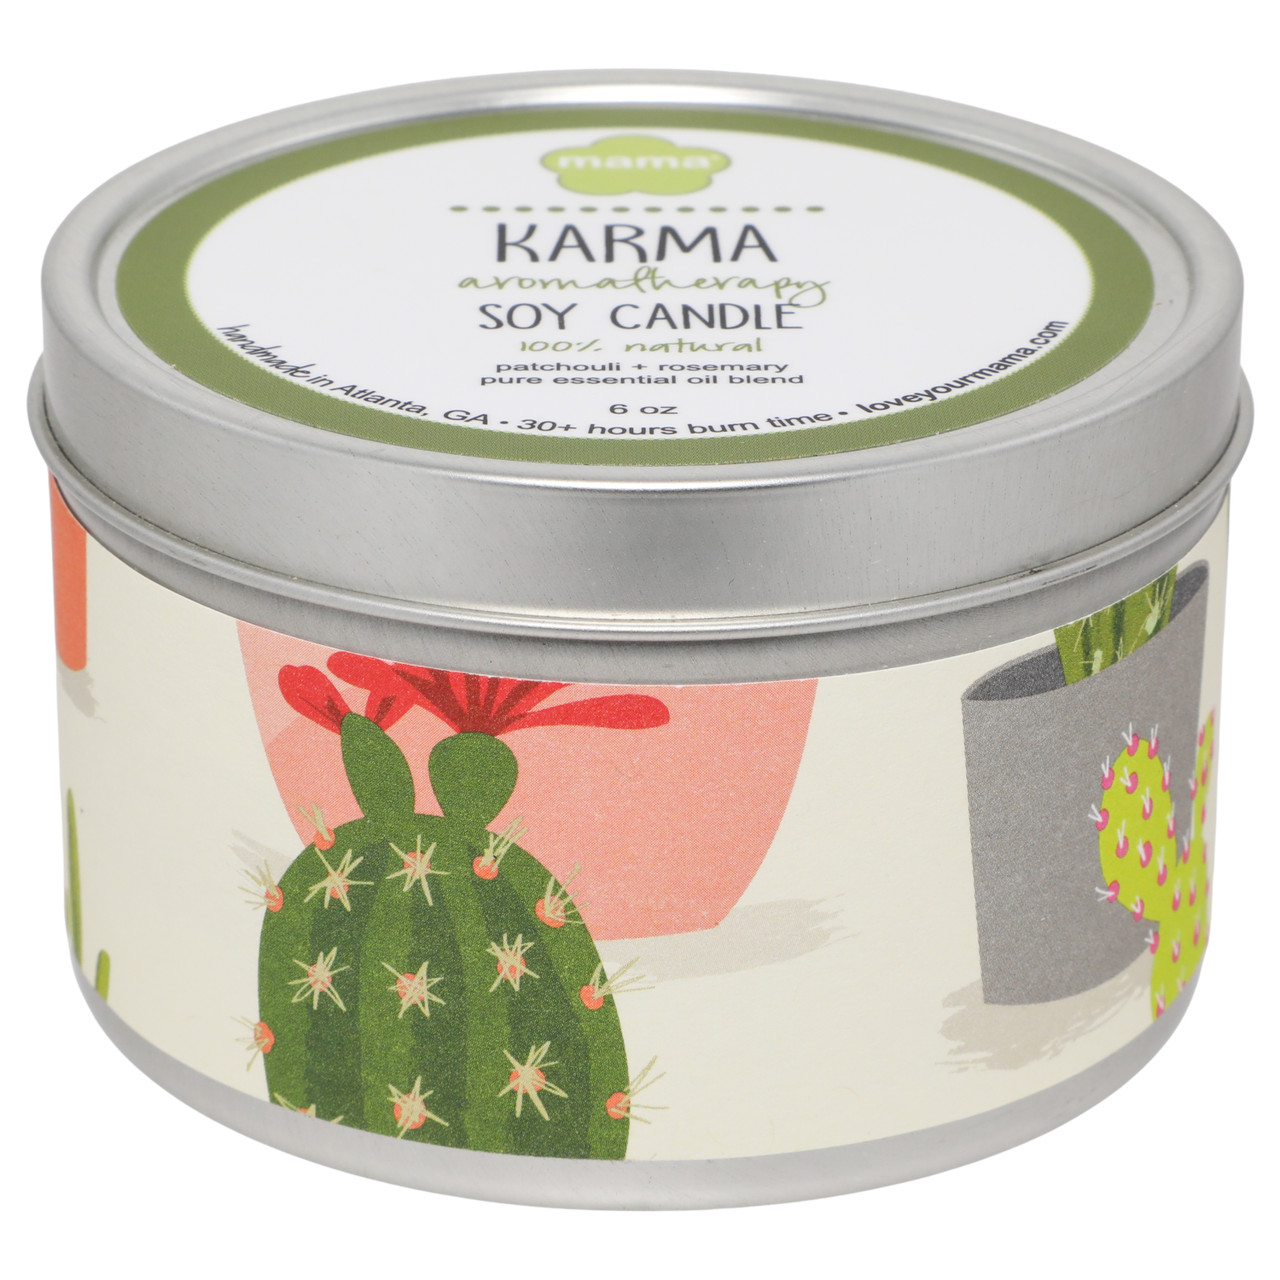 Karma (Patchouli + Rosemary) 6 oz. Soy Candle Tin   Mama Bath + Body